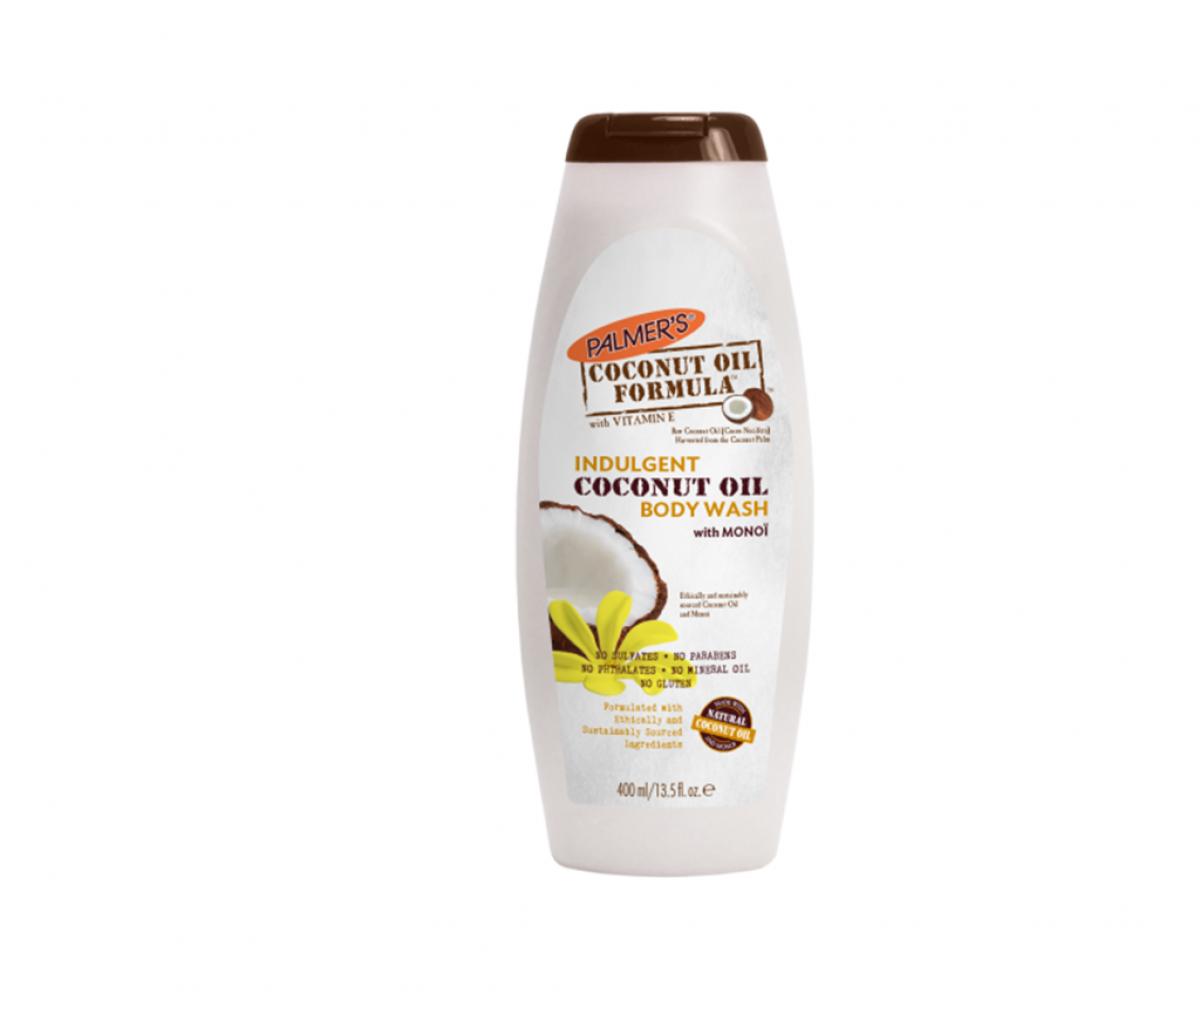 Palmers coconut oil formula indulgent body wash